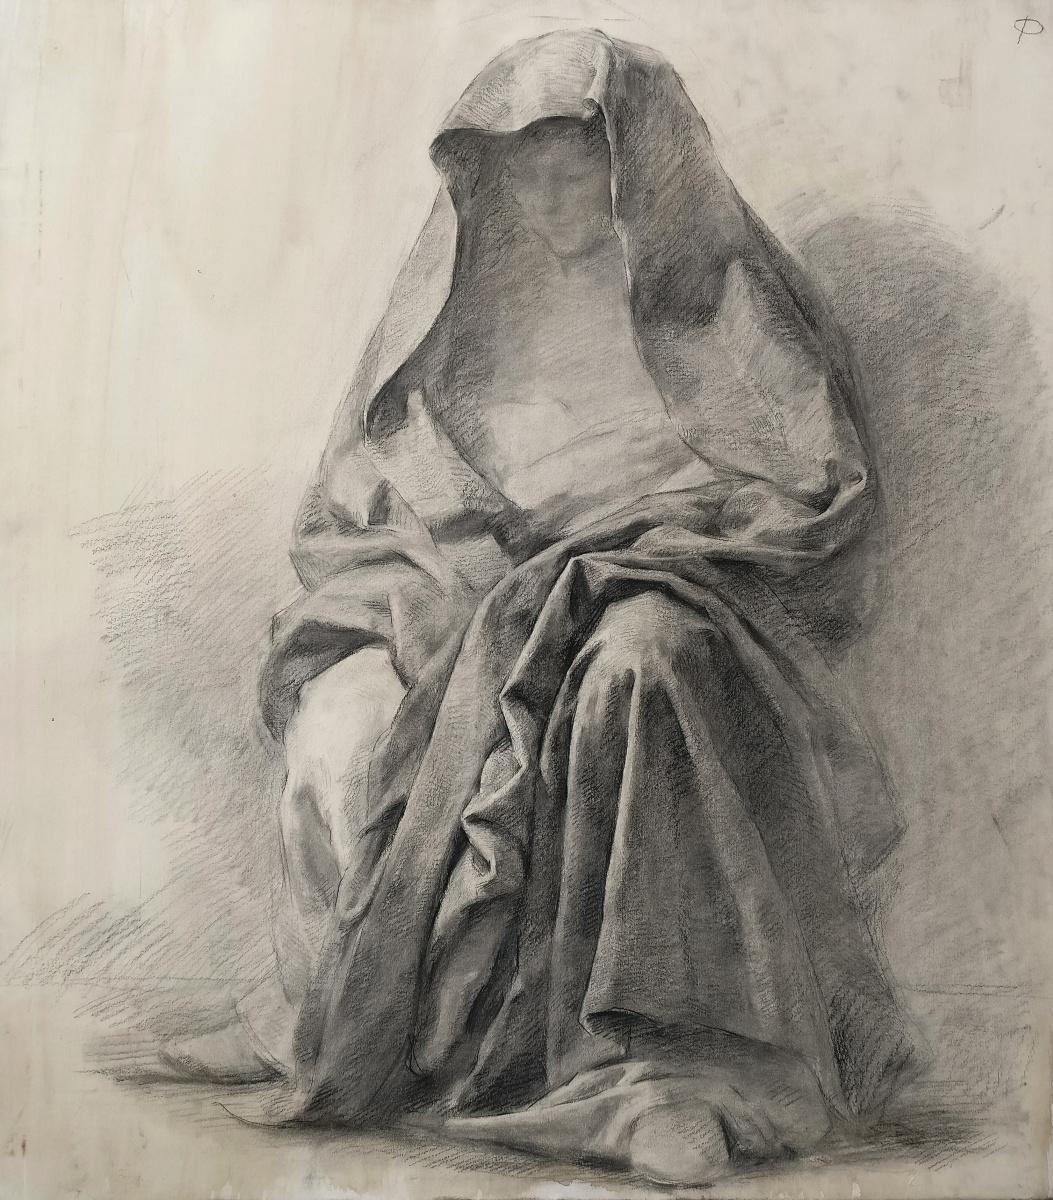 Samir Rakhmanov. Study of Folds